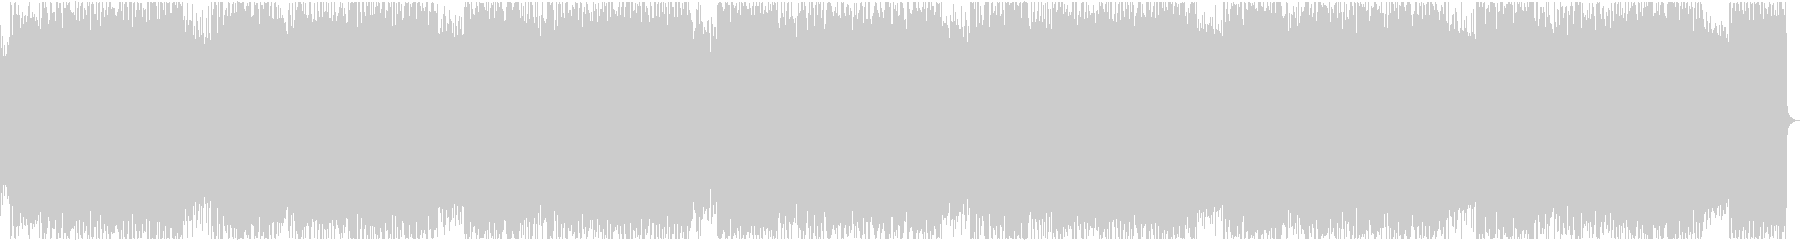 News26 16bit48kHzVerの未再生の波形